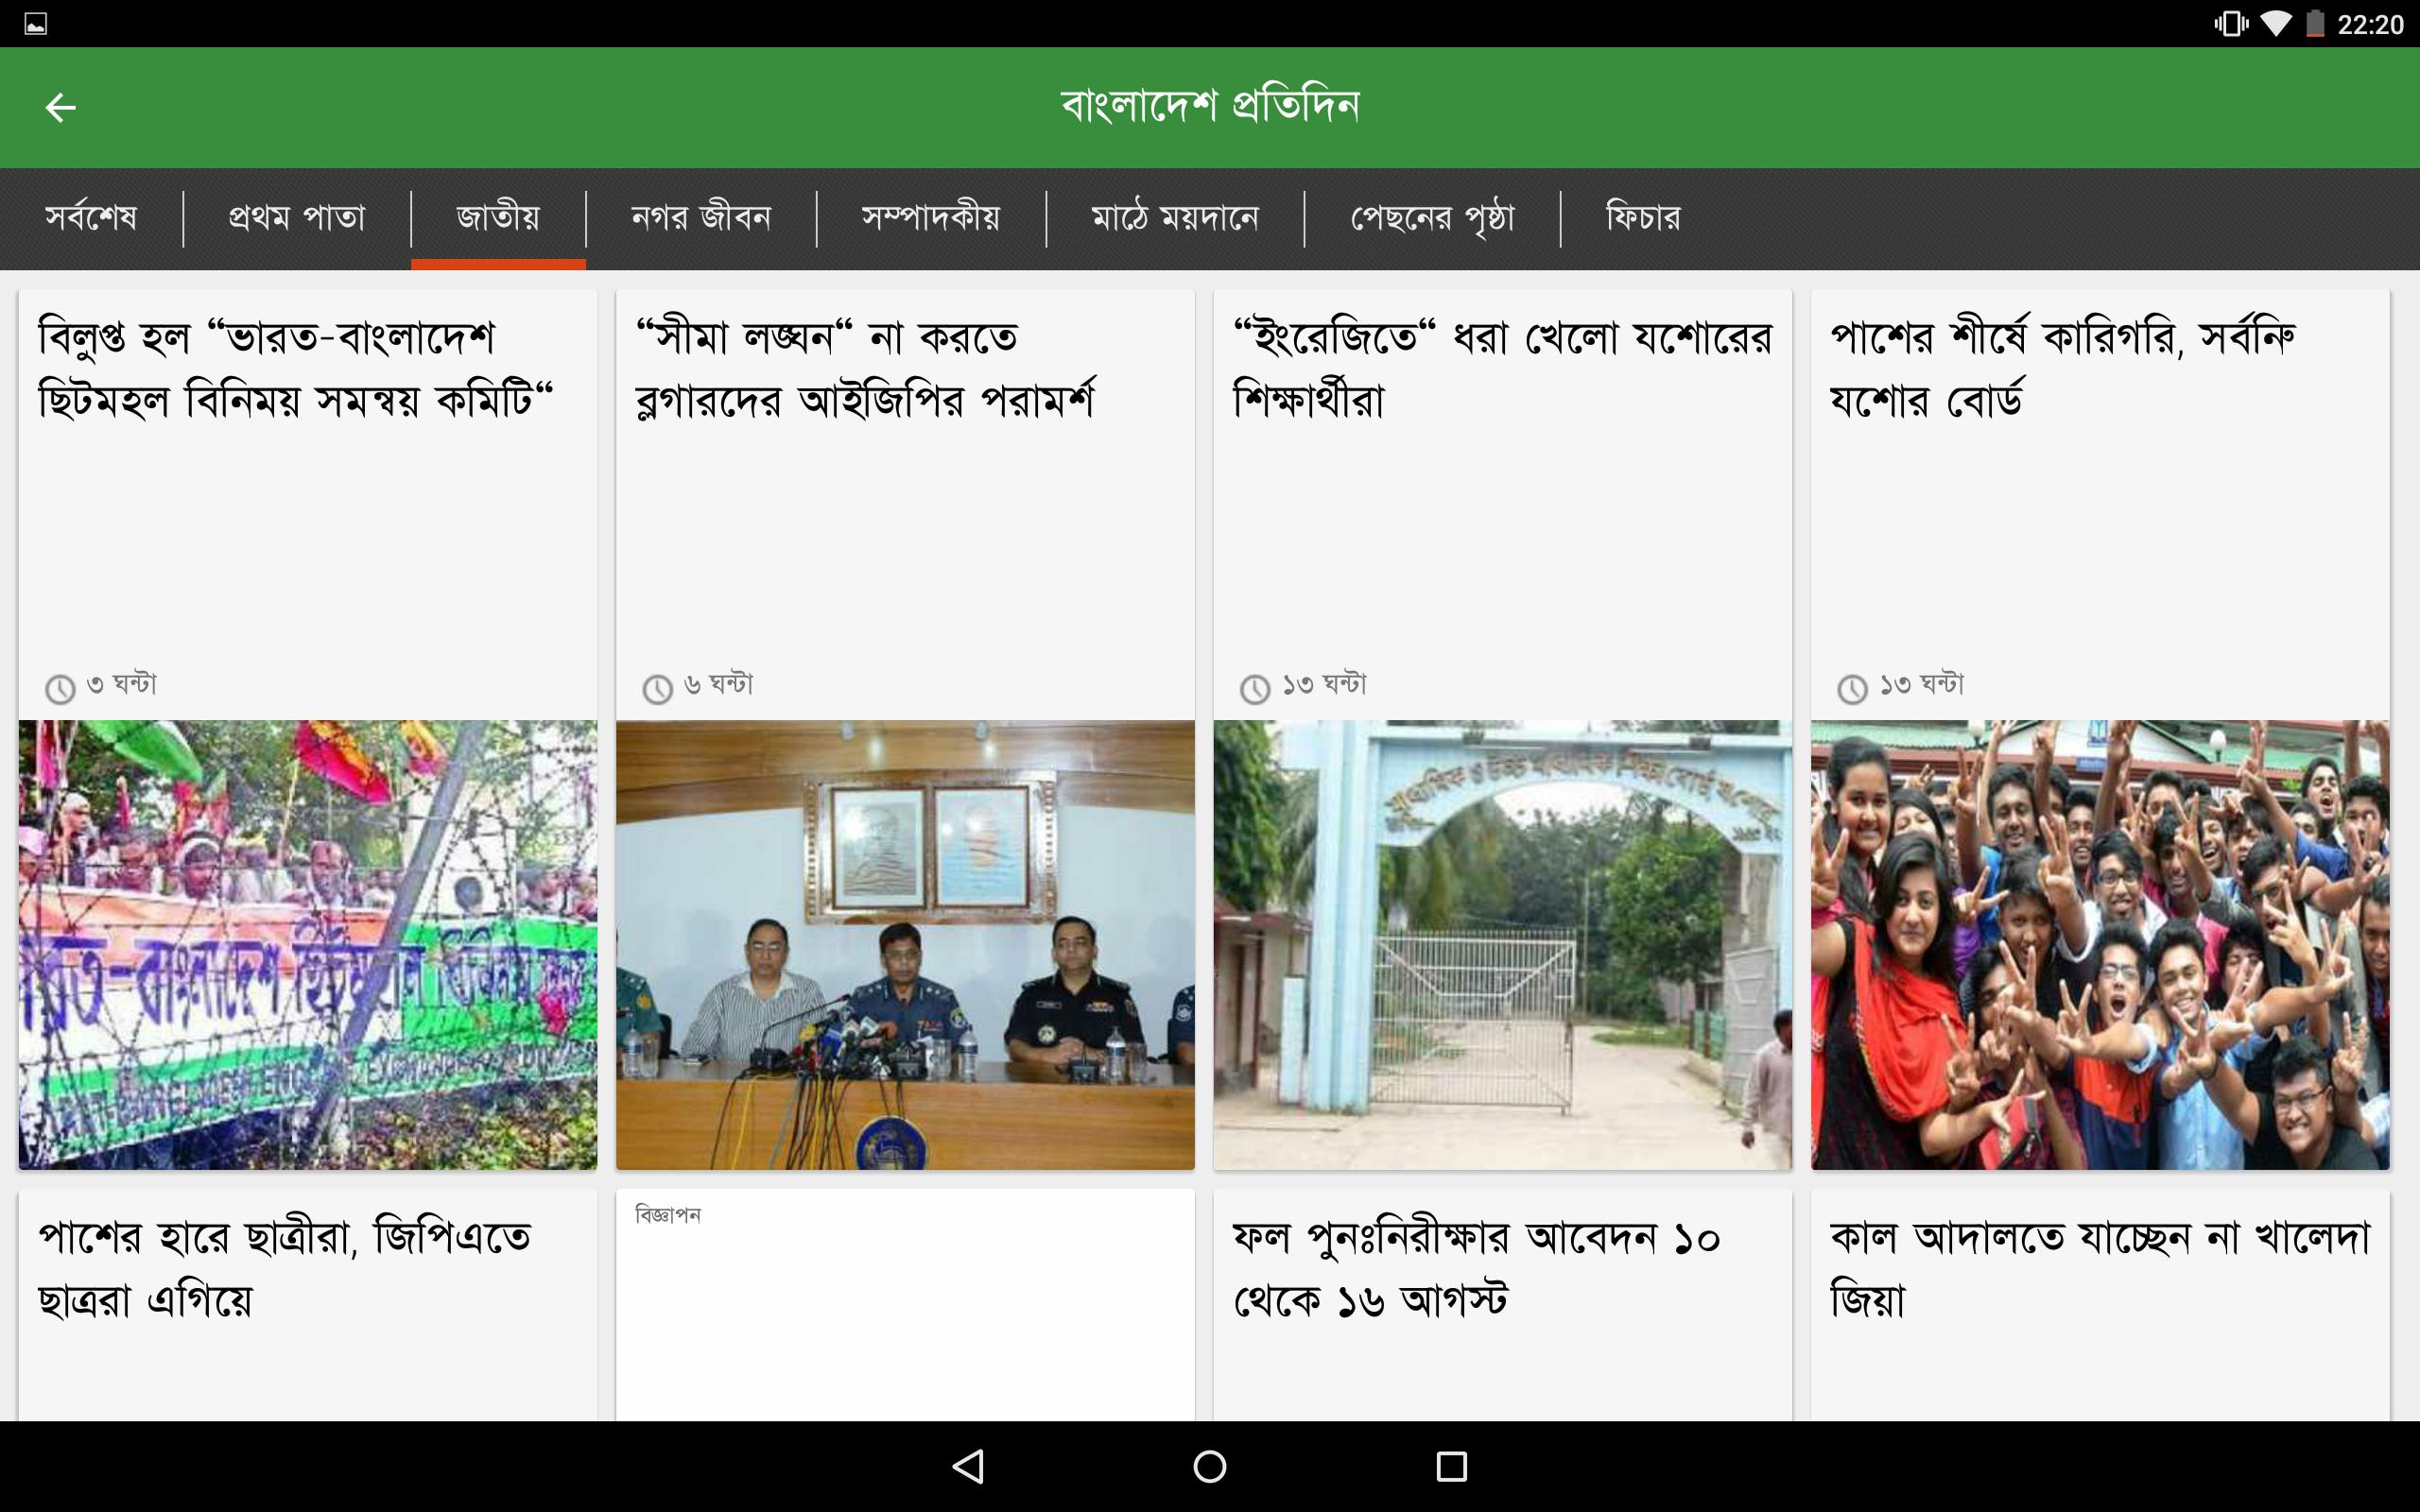 Bangla News & TV: Bangi News 9 تصوير الشاشة